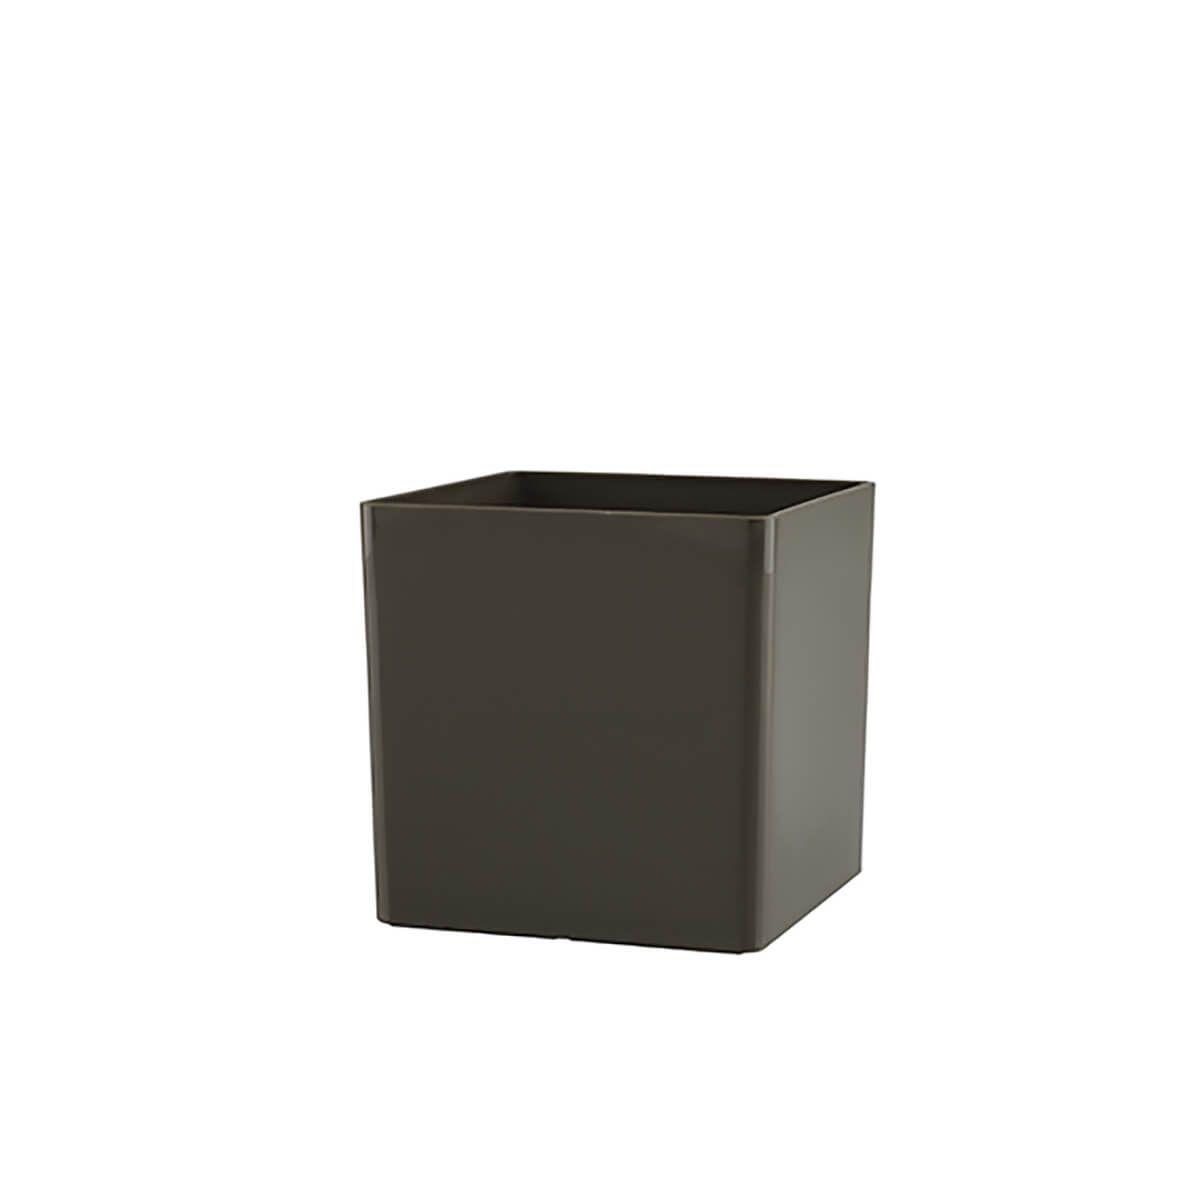 Vaso Cubo 14 x 14 cm Taupe Vasart